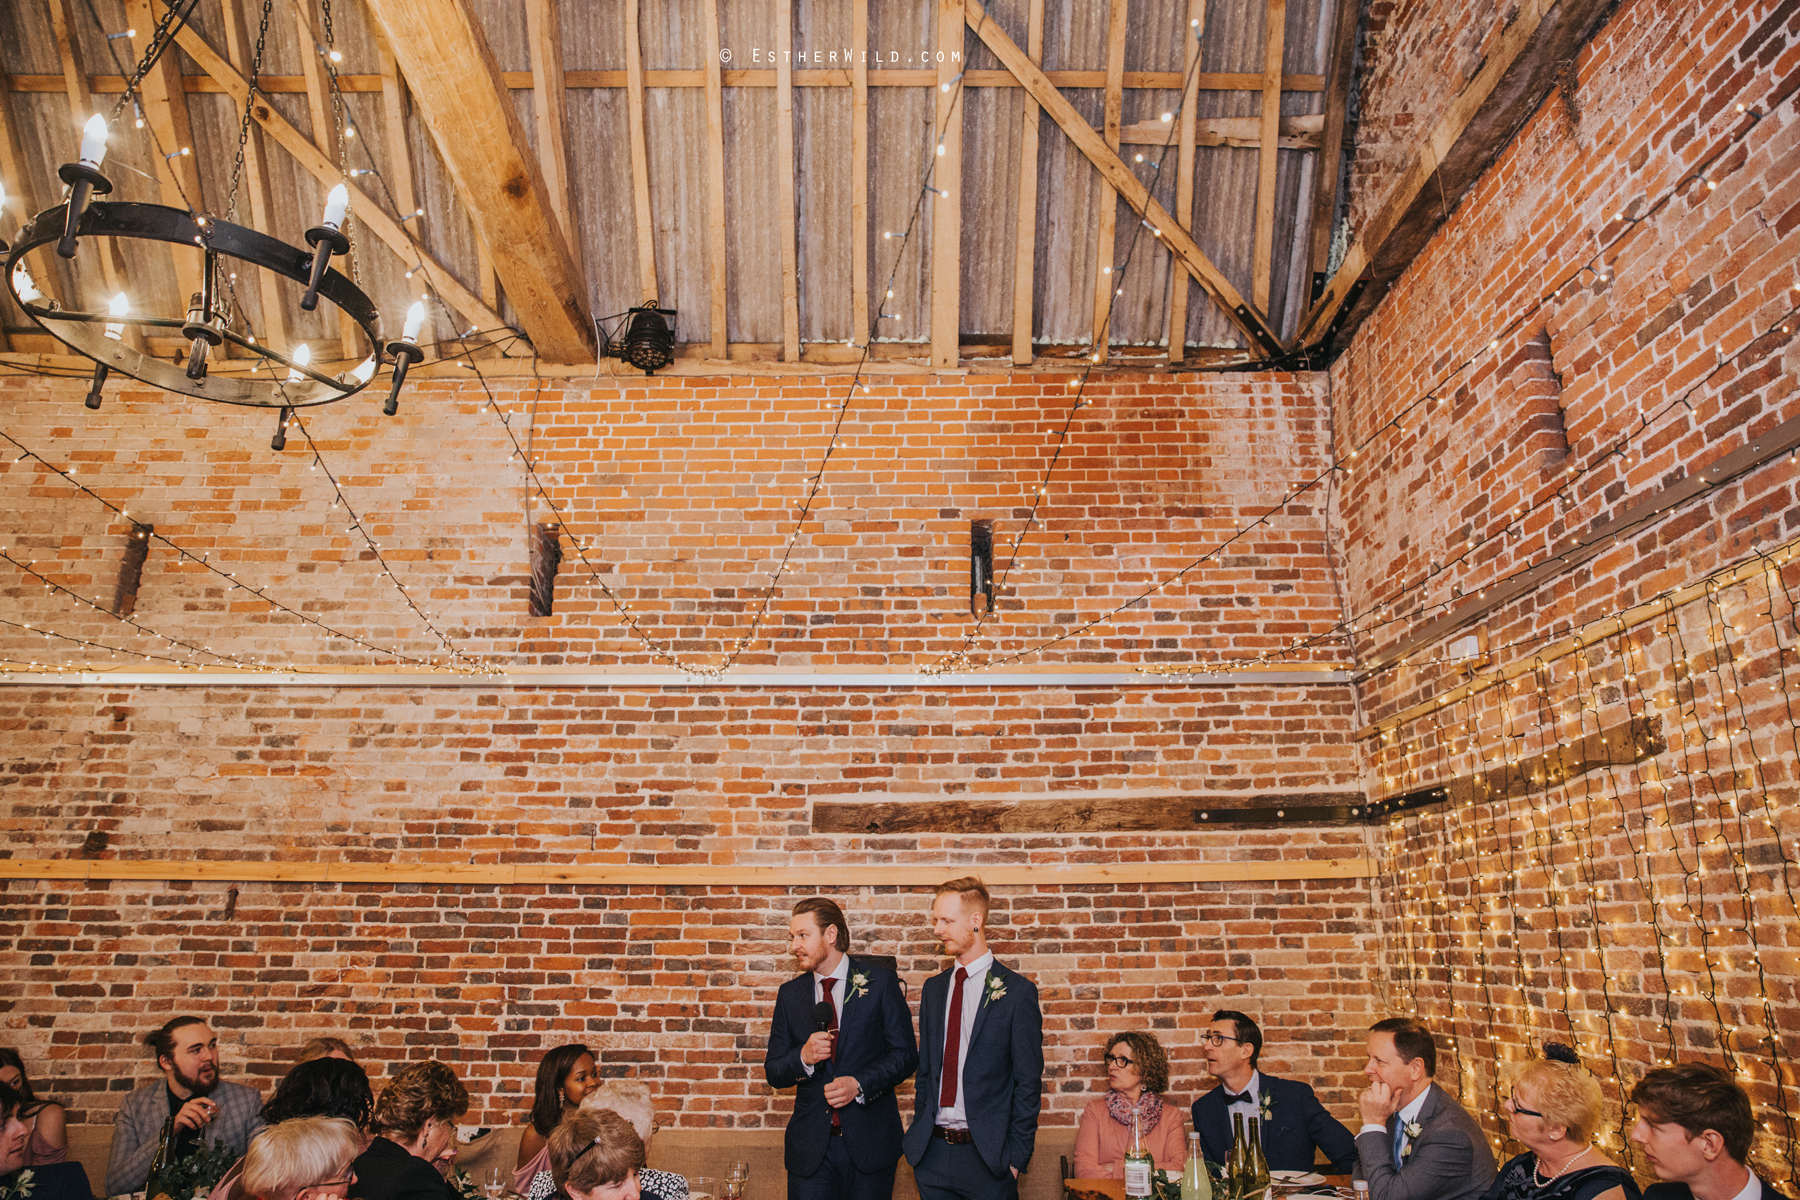 Glebe_Farm_Barn_Rustic_Norfolk_Wedding_Esther_Wild_Photographer_Copyright_IMG_2446.jpg